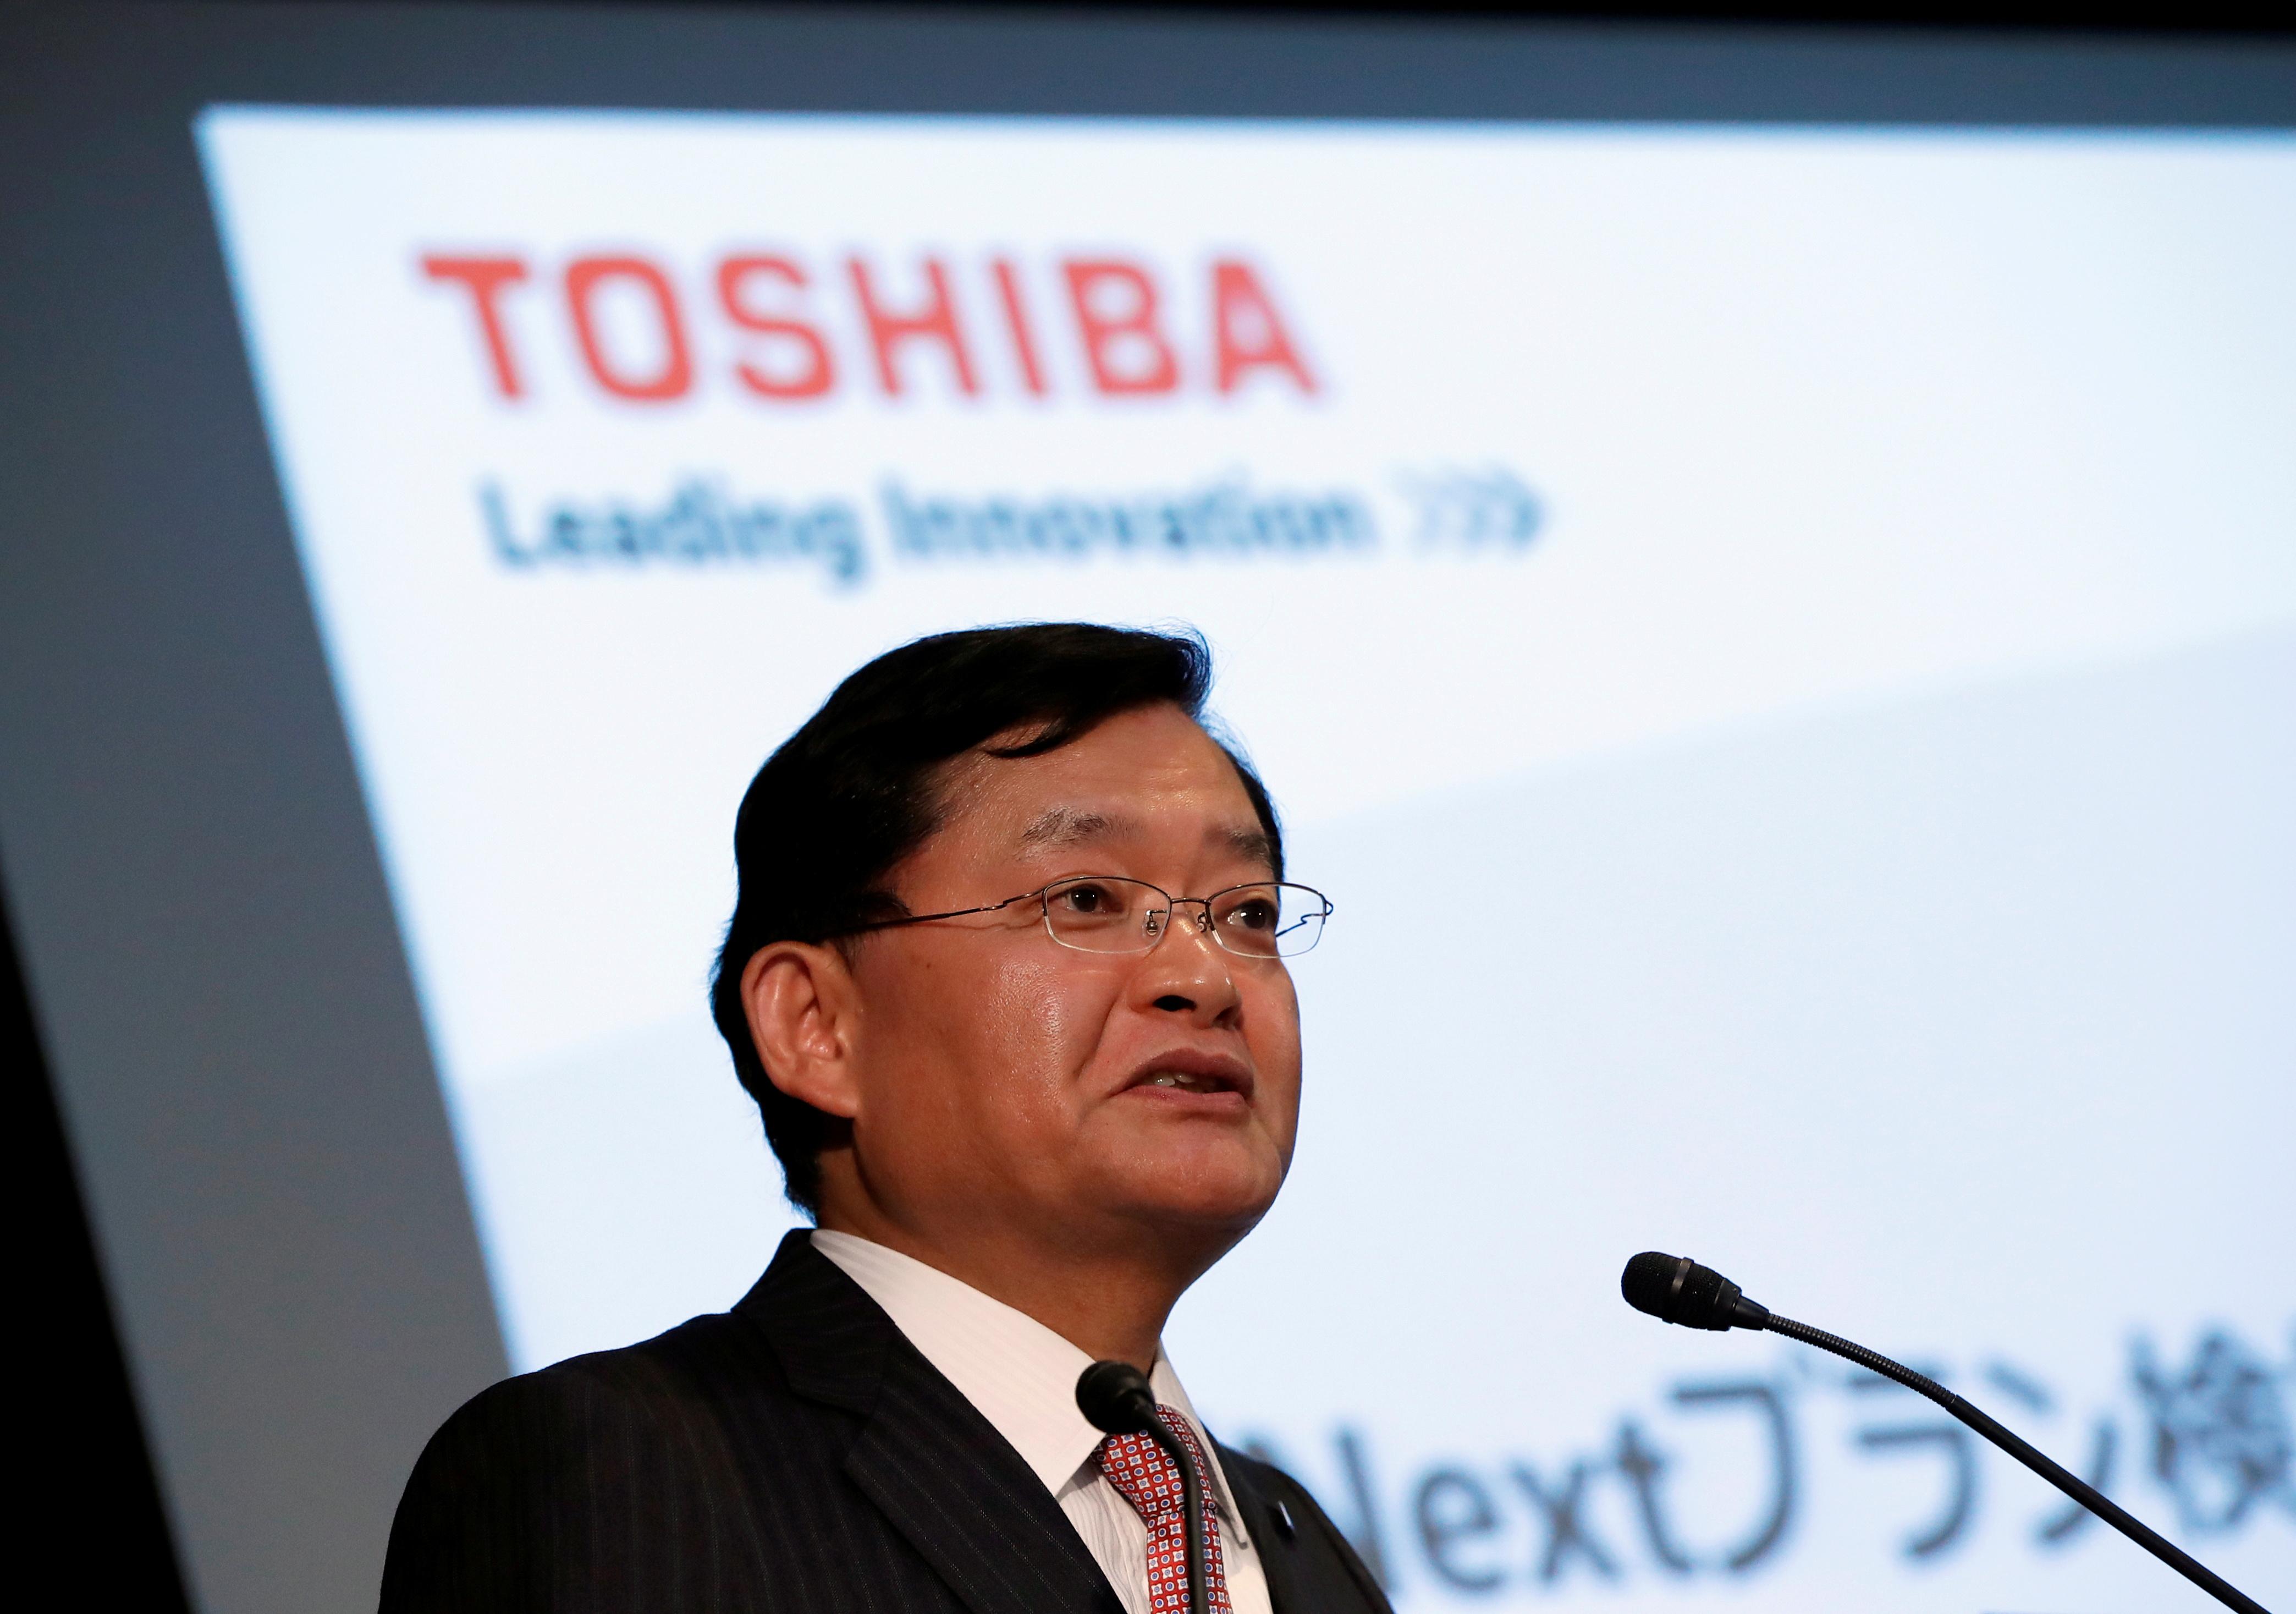 Toshiba Corp's CEO Nobuaki Kurumatani attends a news conference at the company's headquarters in Tokyo, Japan,  May 15, 2018.  REUTERS/Issei Kato